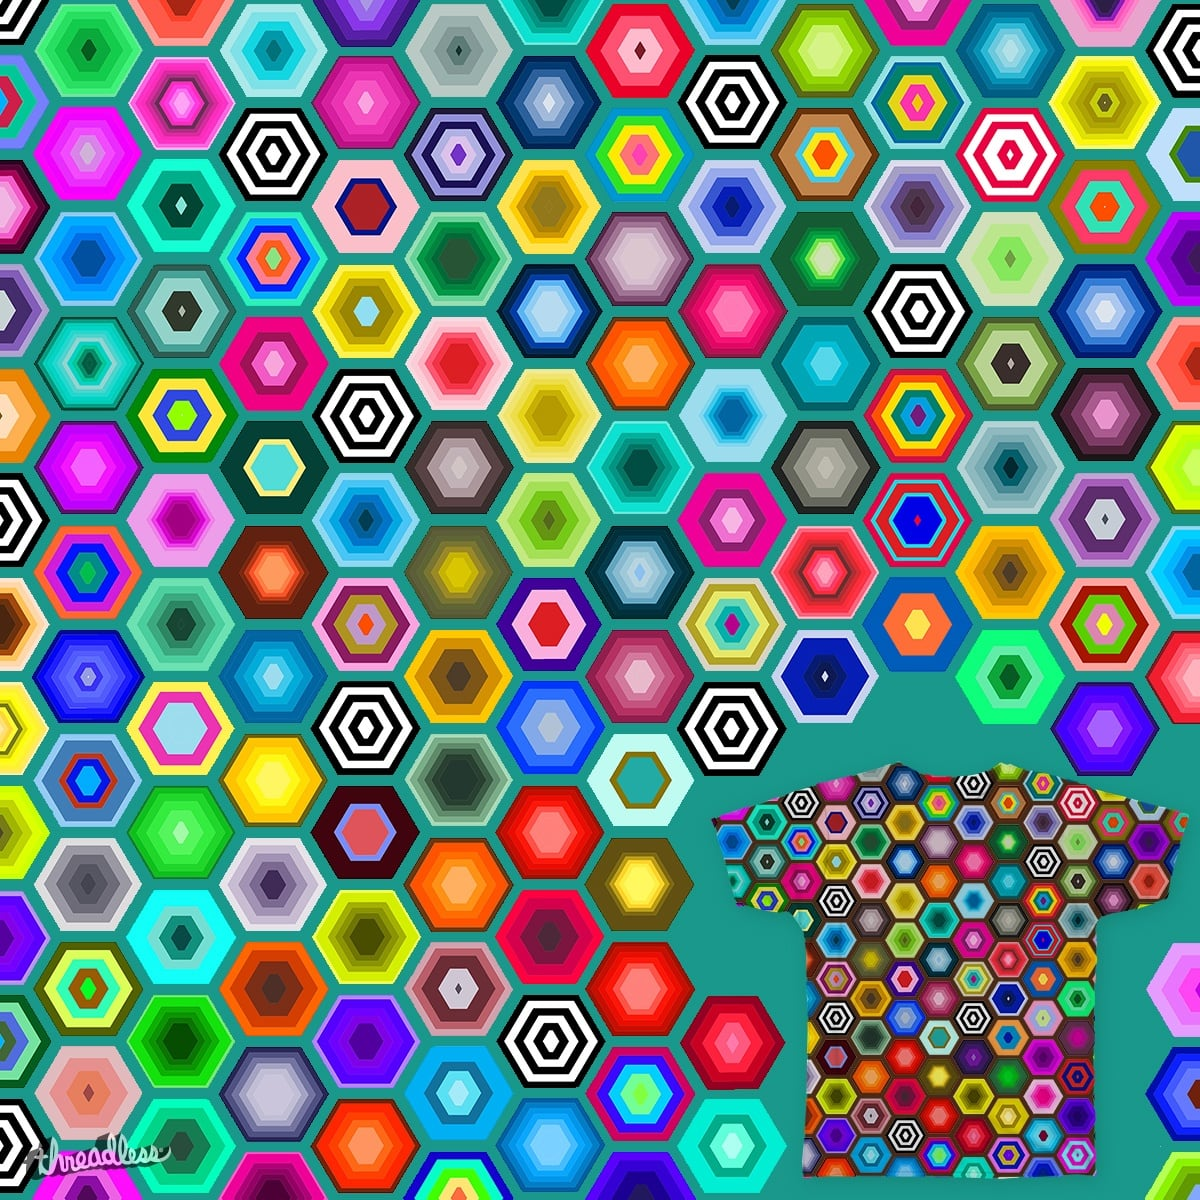 Hexa-Gone by bobogalvan on Threadless